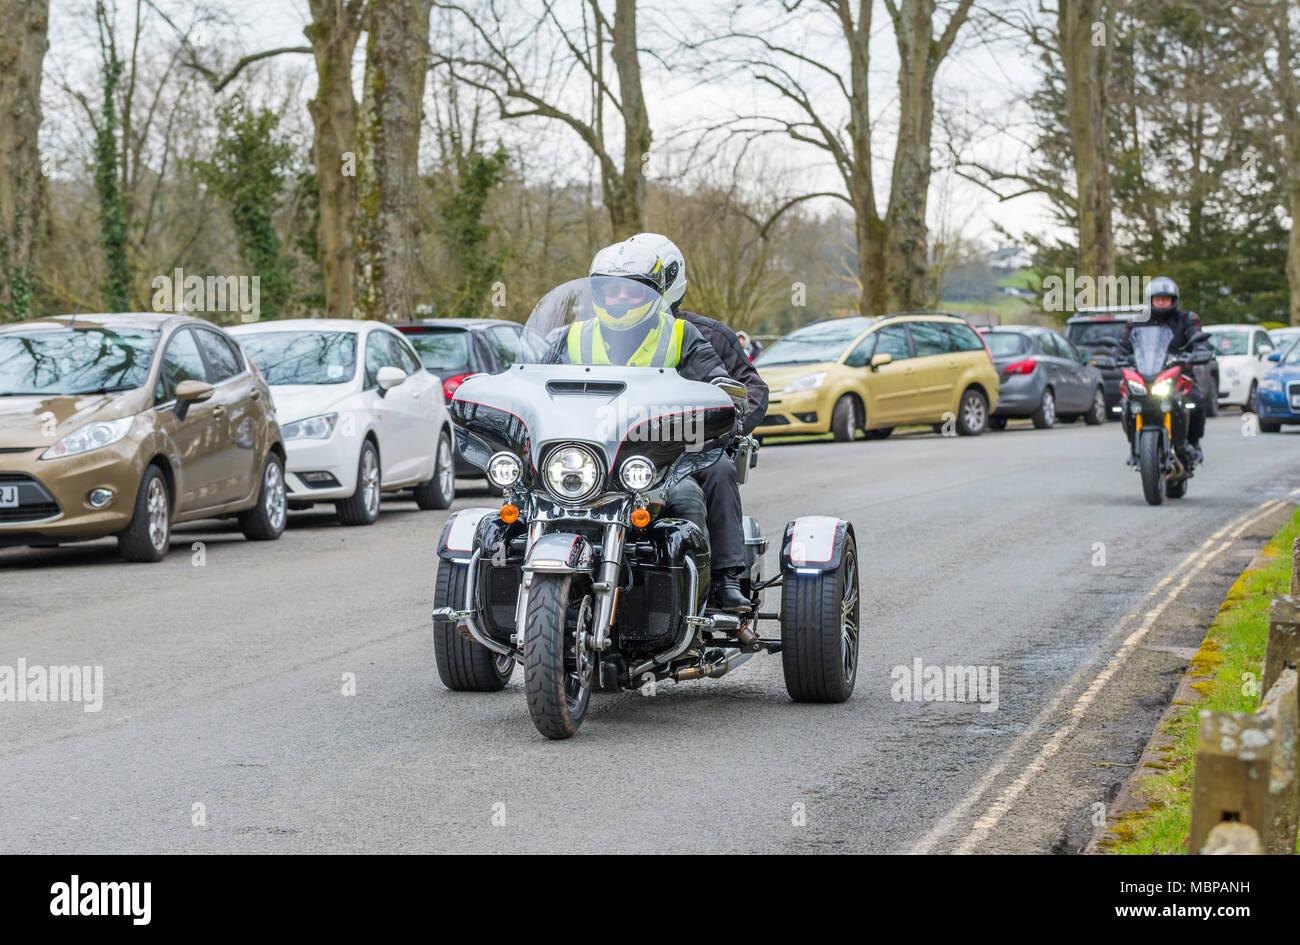 Man riding a Harley Davidson Trike with pillion passenger in the UK. Harley Davidson 3 wheeled motorcycle. Motorbike with 3 wheels. - Stock Image